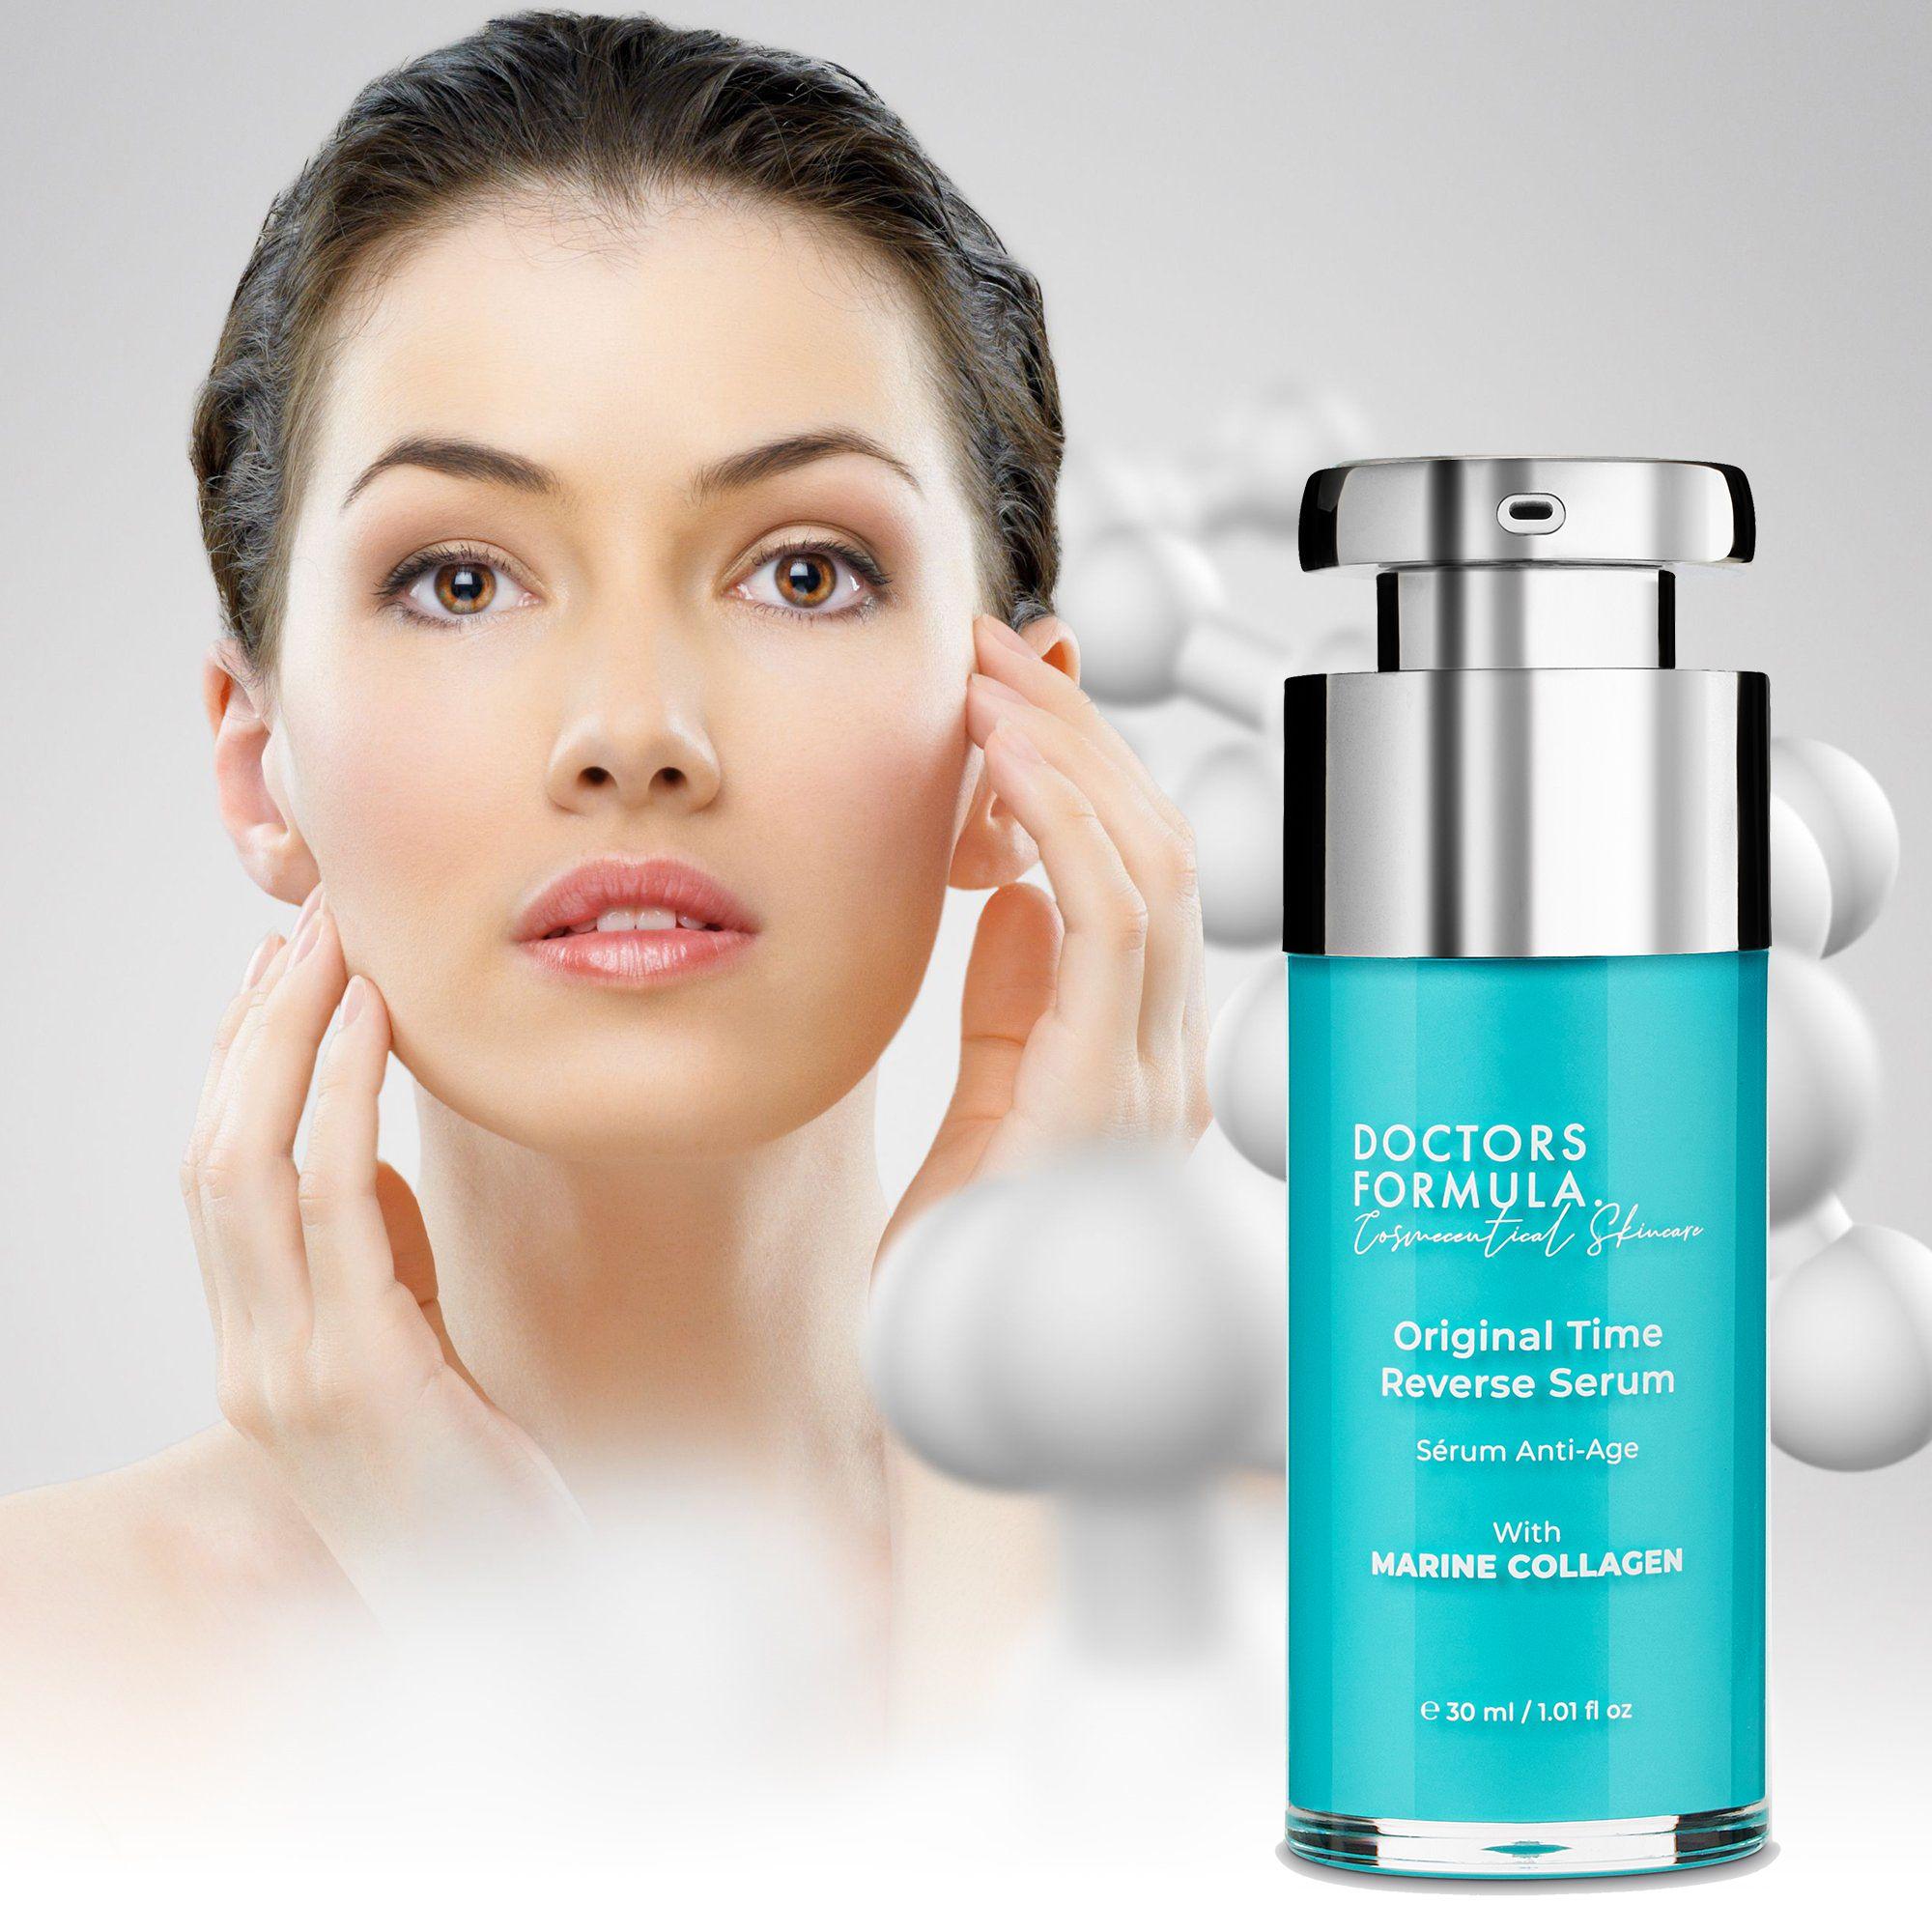 Doctors Formula Marine Collagen Original Time Reverse Serum 30ml